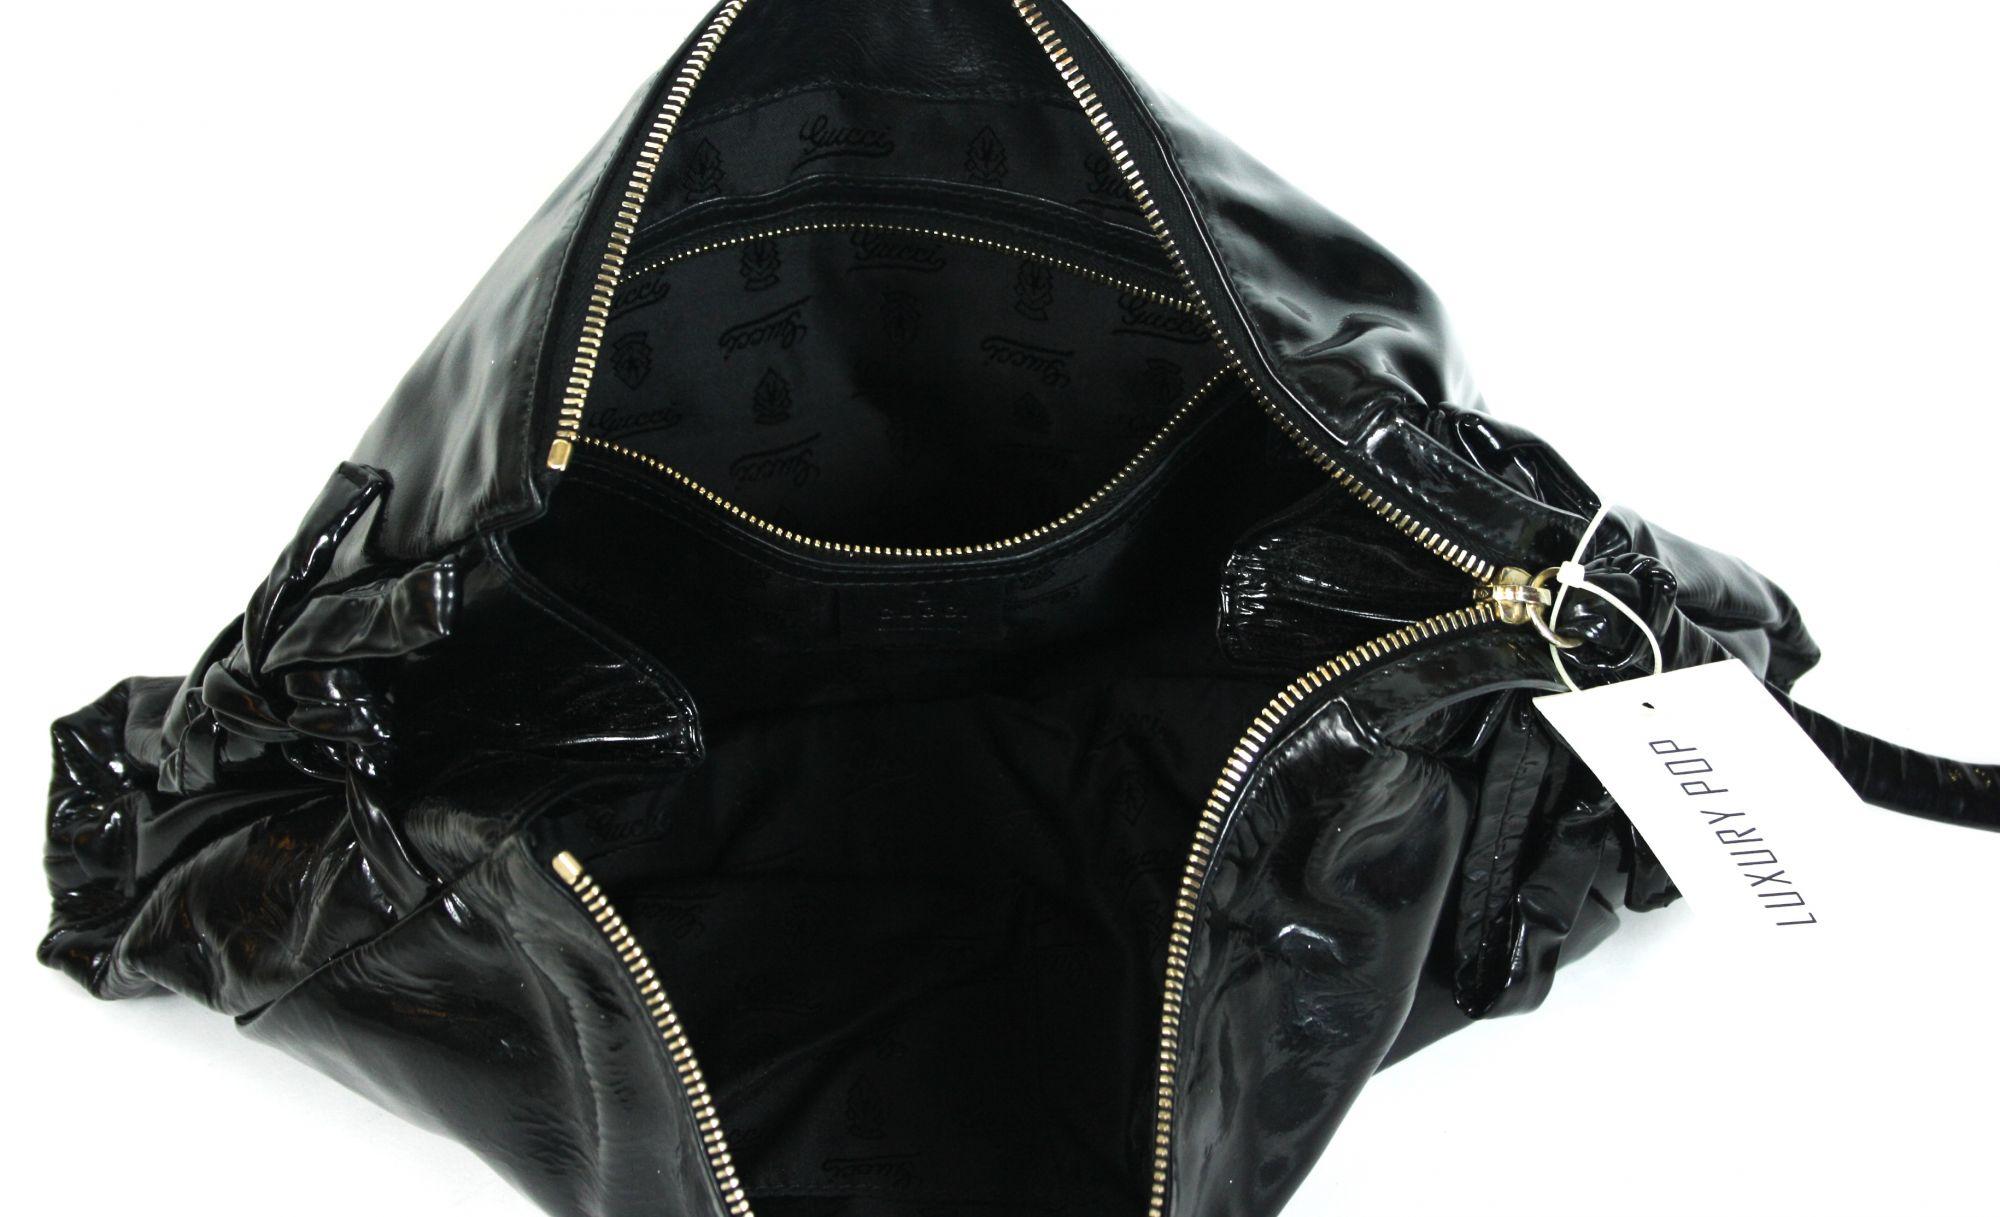 Black Patent Leather Hysteria Clutch